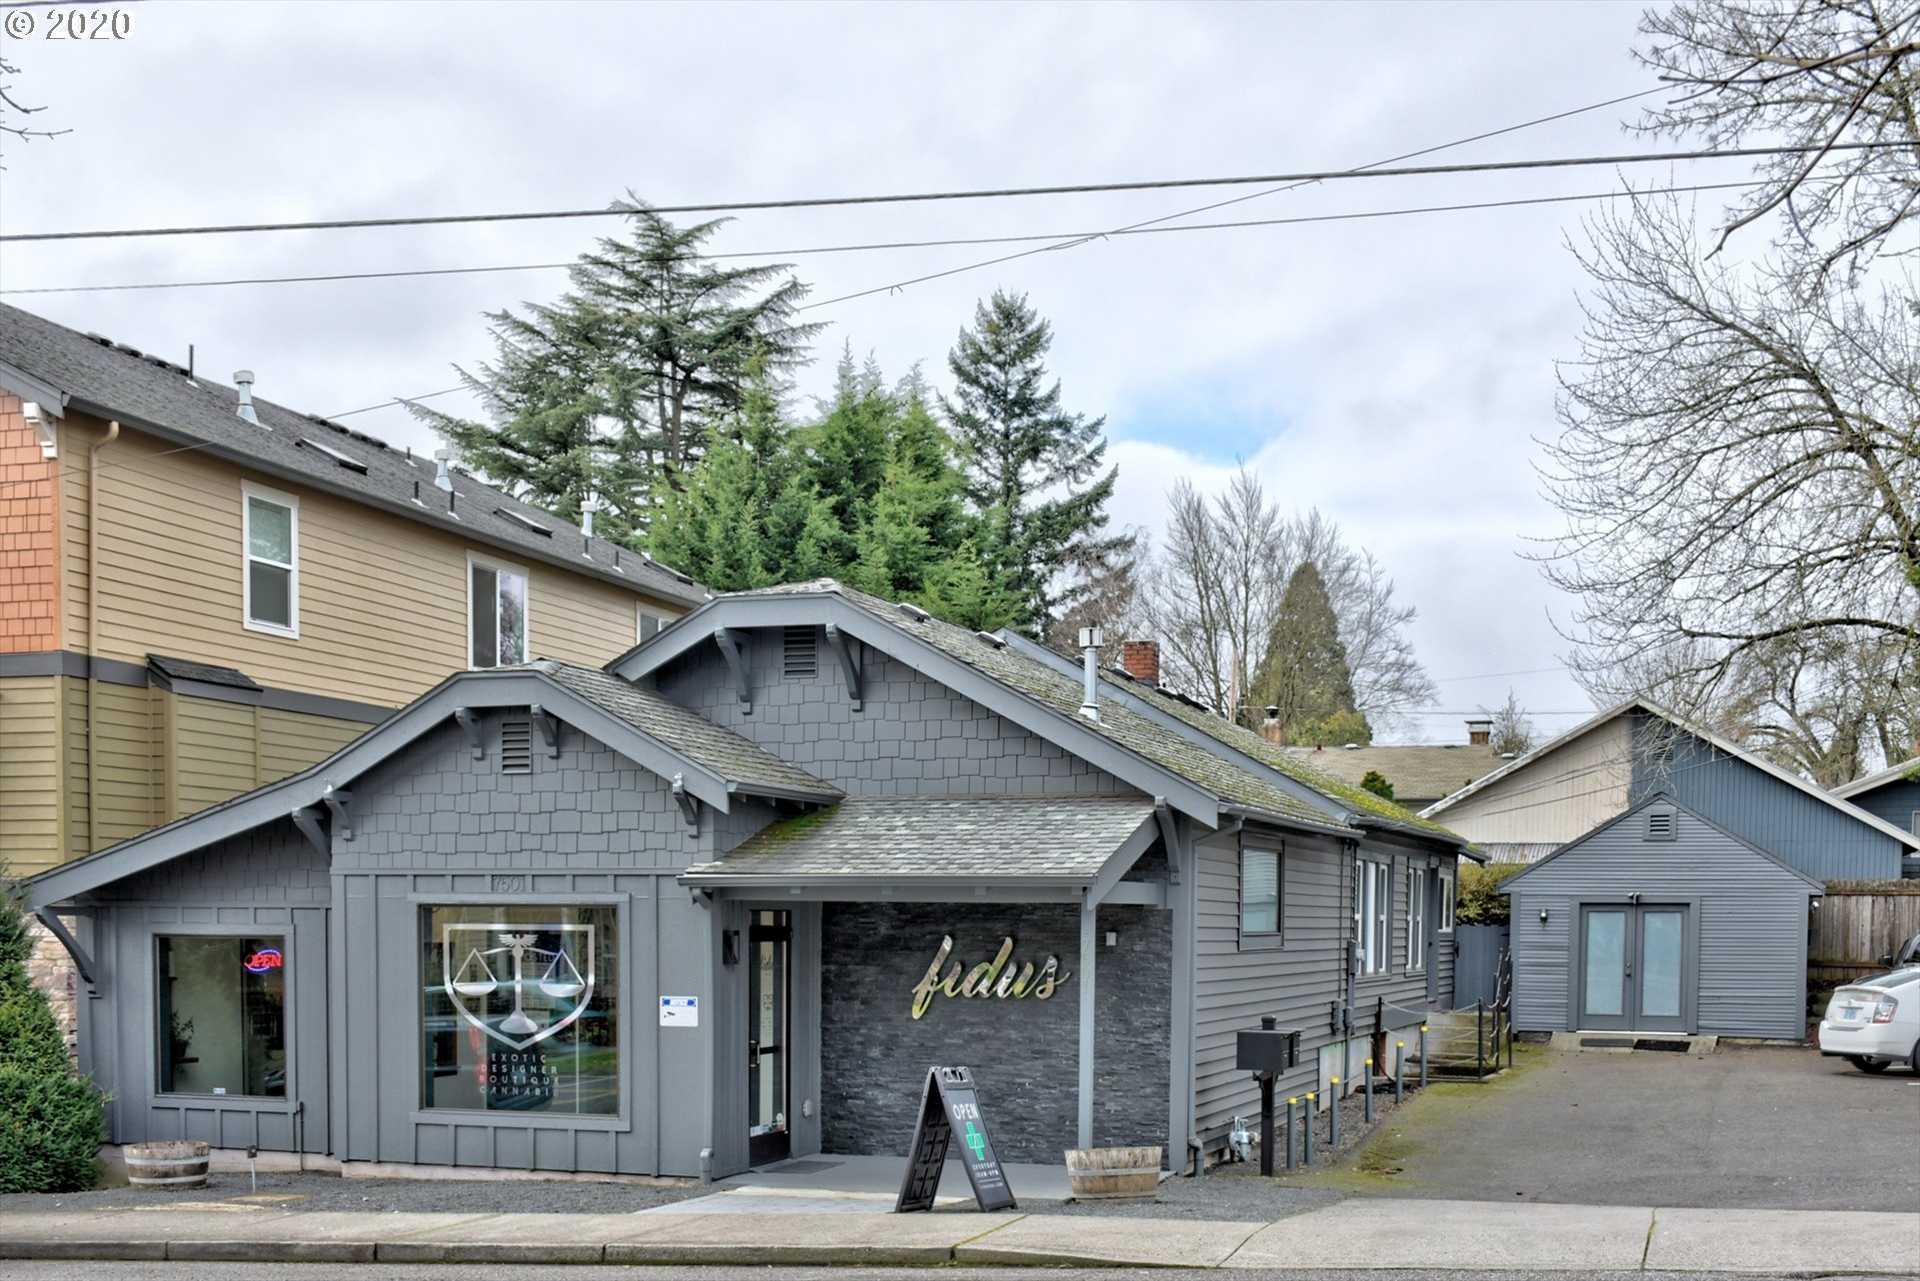 $2,950,000 - 3Br/3Ba -  for Sale in Buckingham Heights, Portland